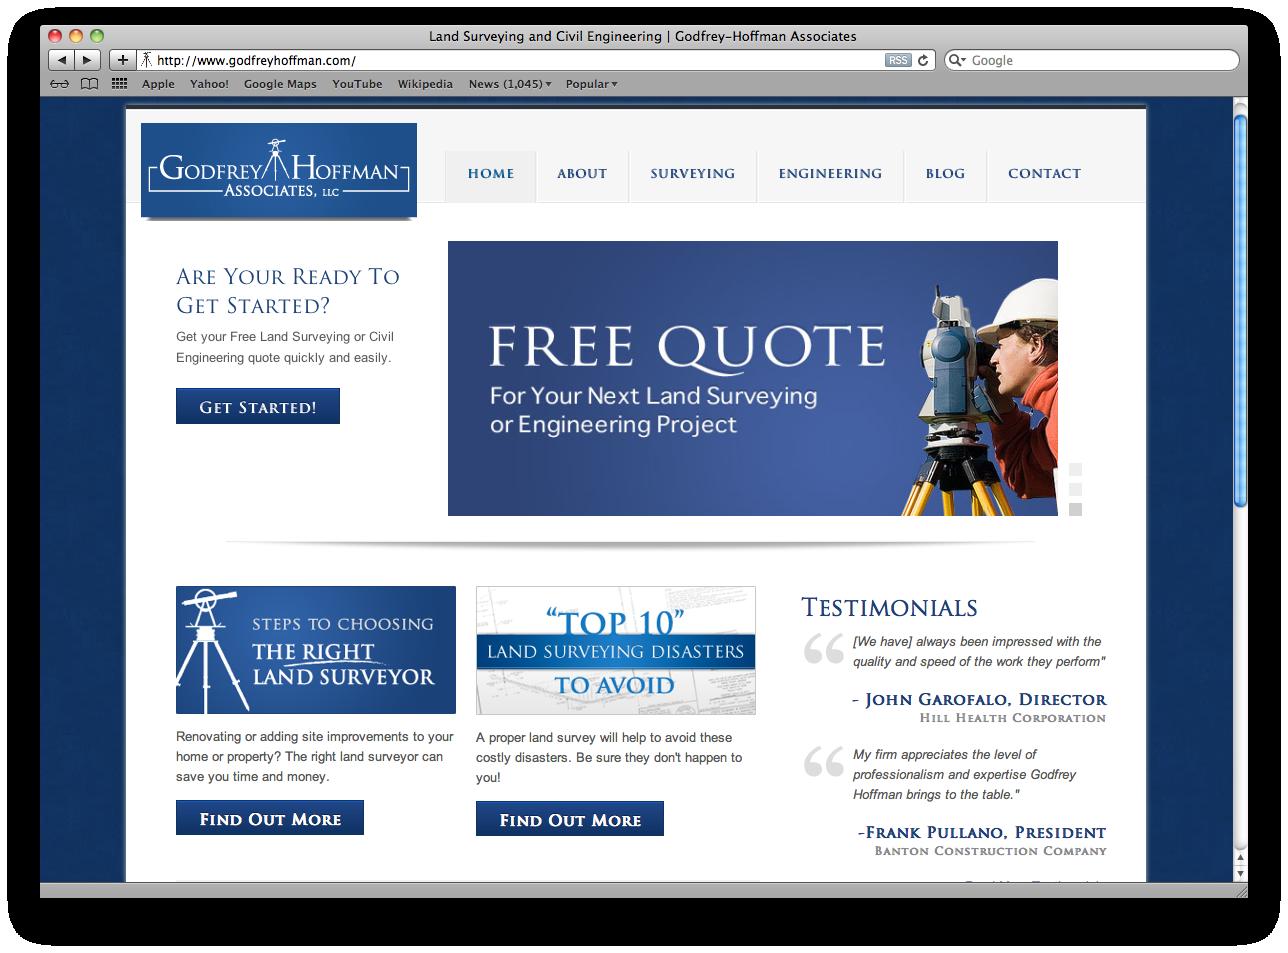 Inbound Marketing Case Studies: A Clients Quick ROI